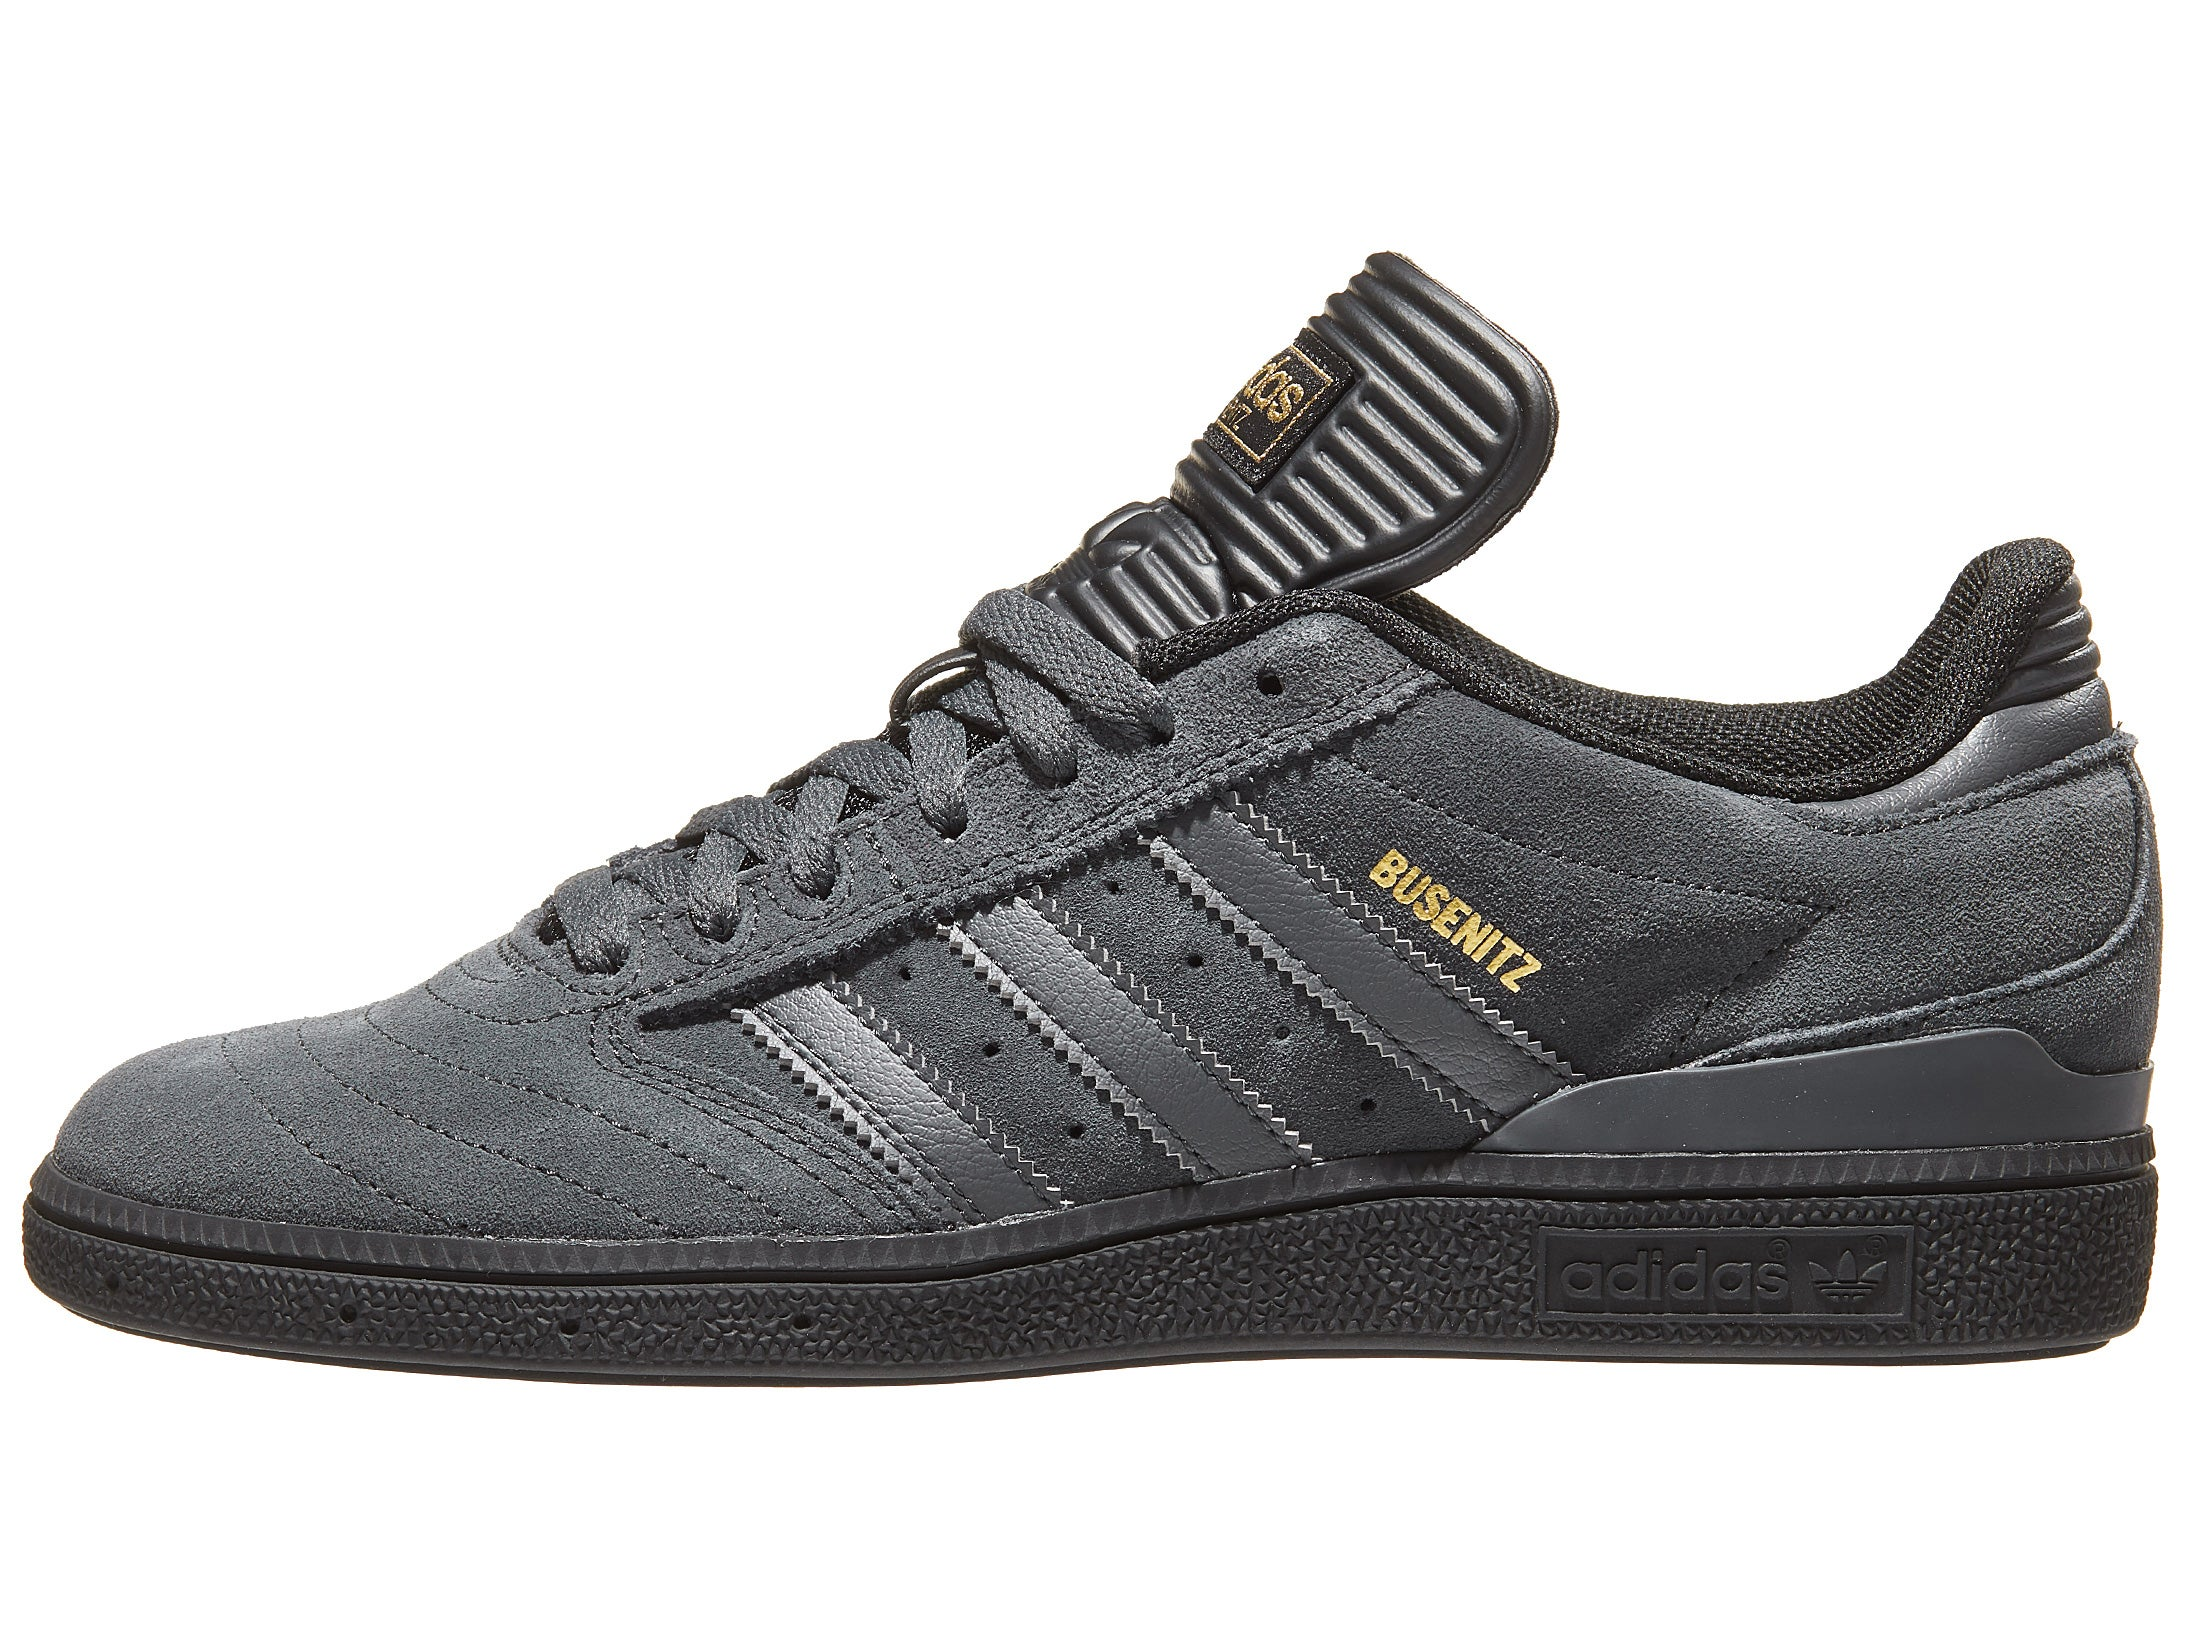 Adidas Busenitz Pro Shoes Grey Black Gold